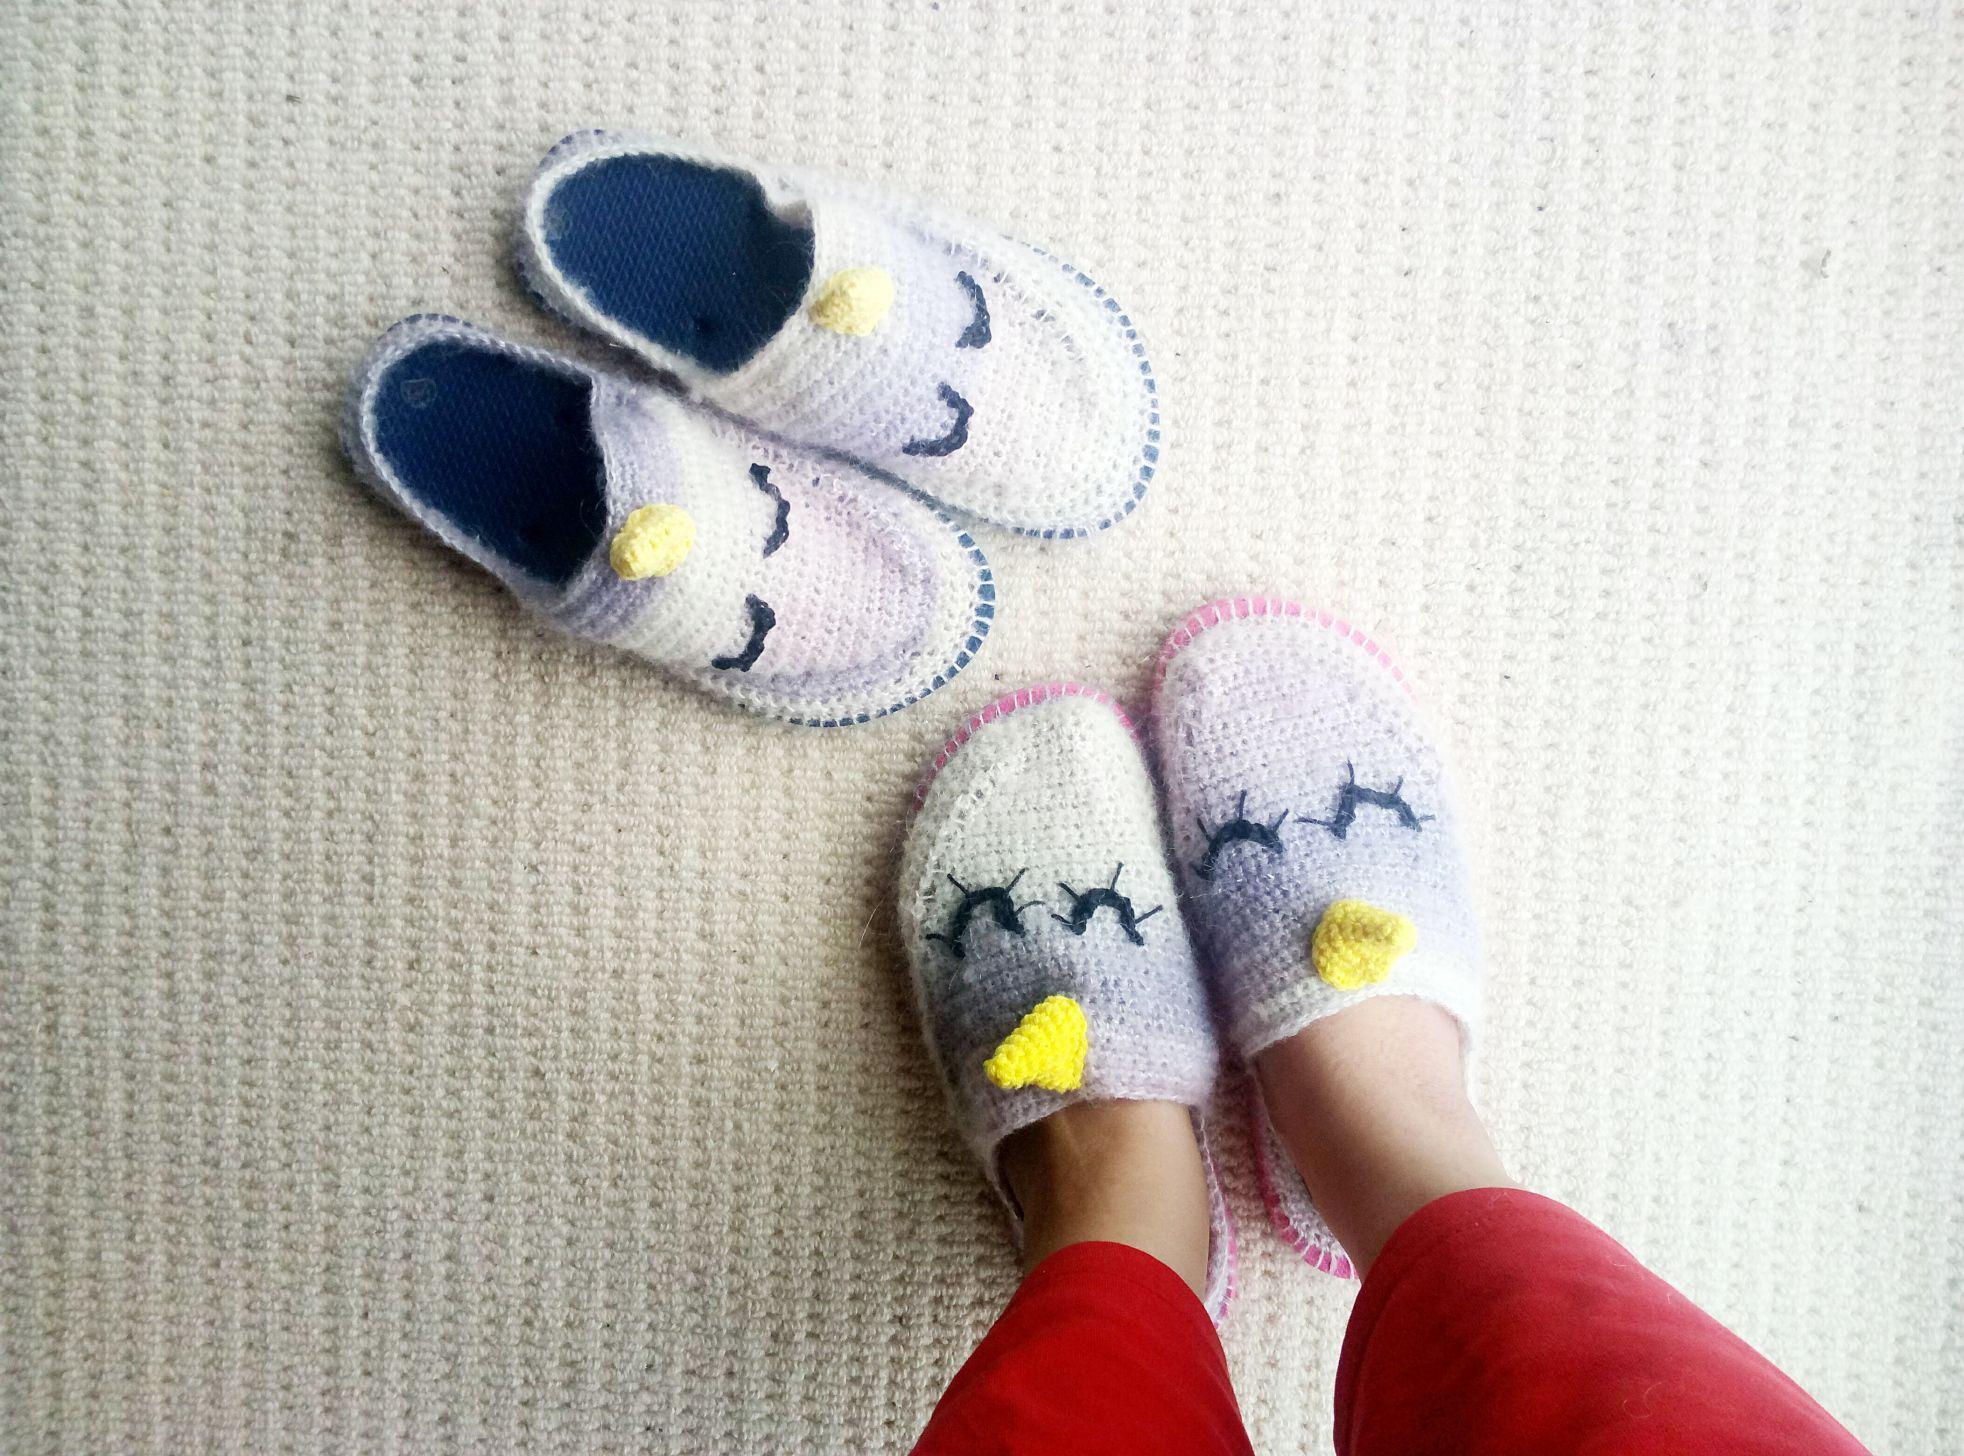 Crochet Unicorn Slippers with flip flop soles - free pattern ...